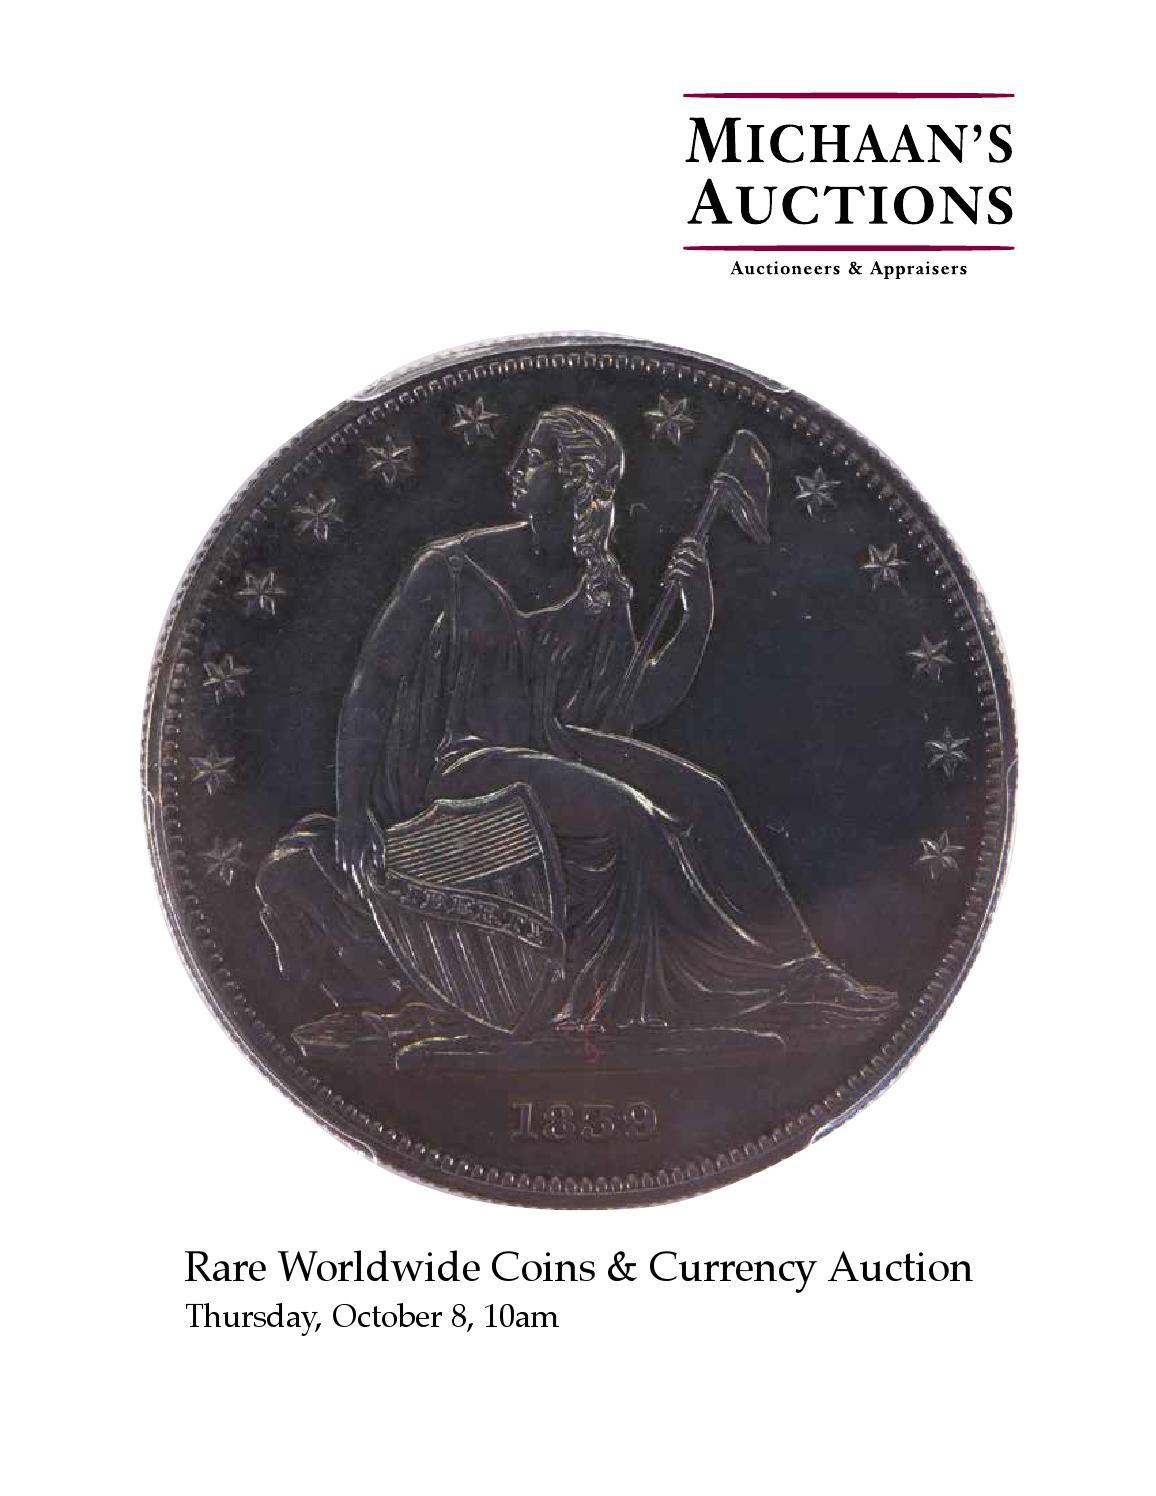 1973 P Jefferson Choice//Gem BU Roll 40 US Coins